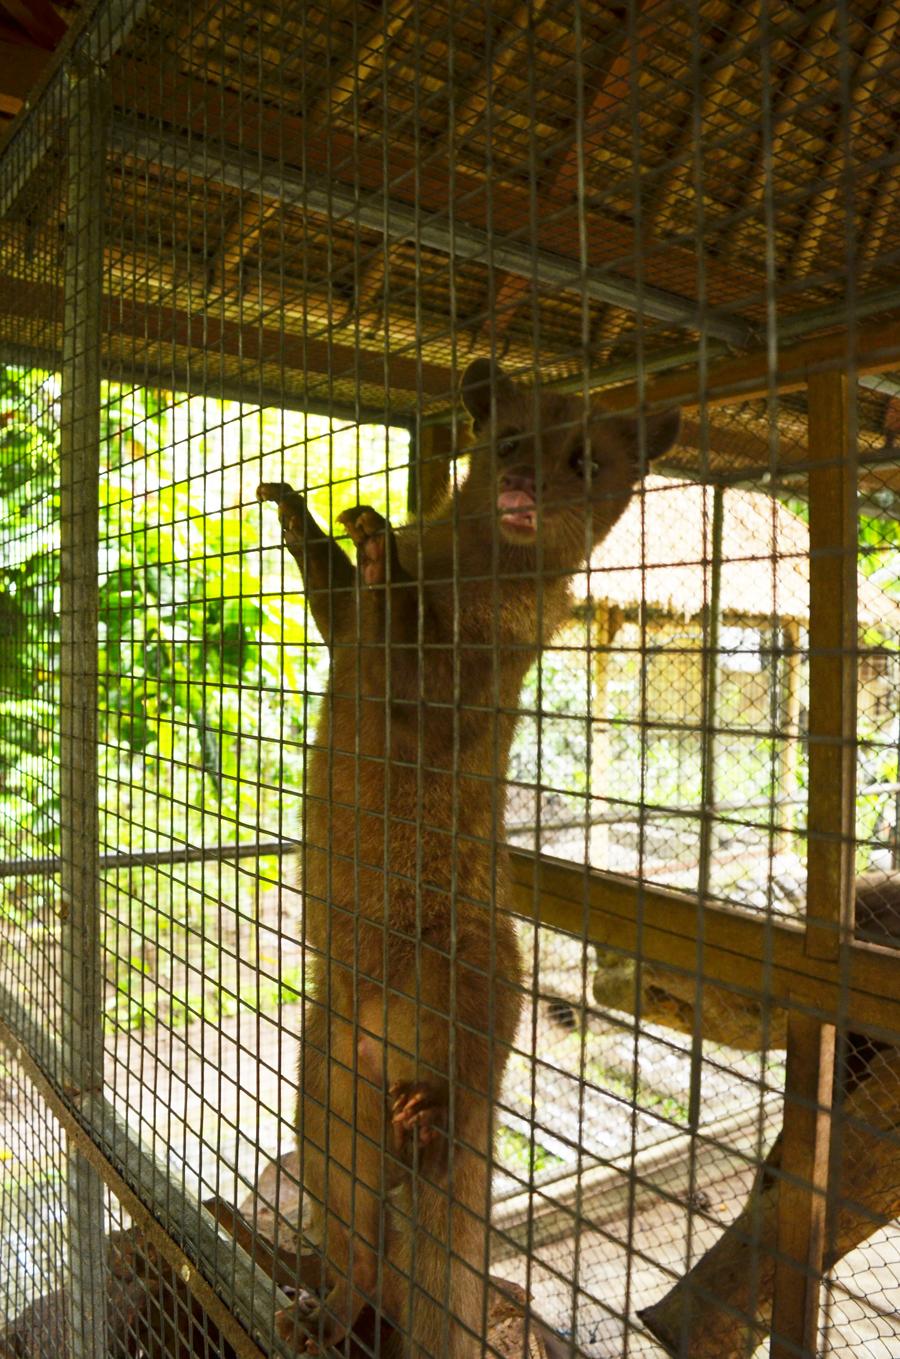 Luwak in captivity :(